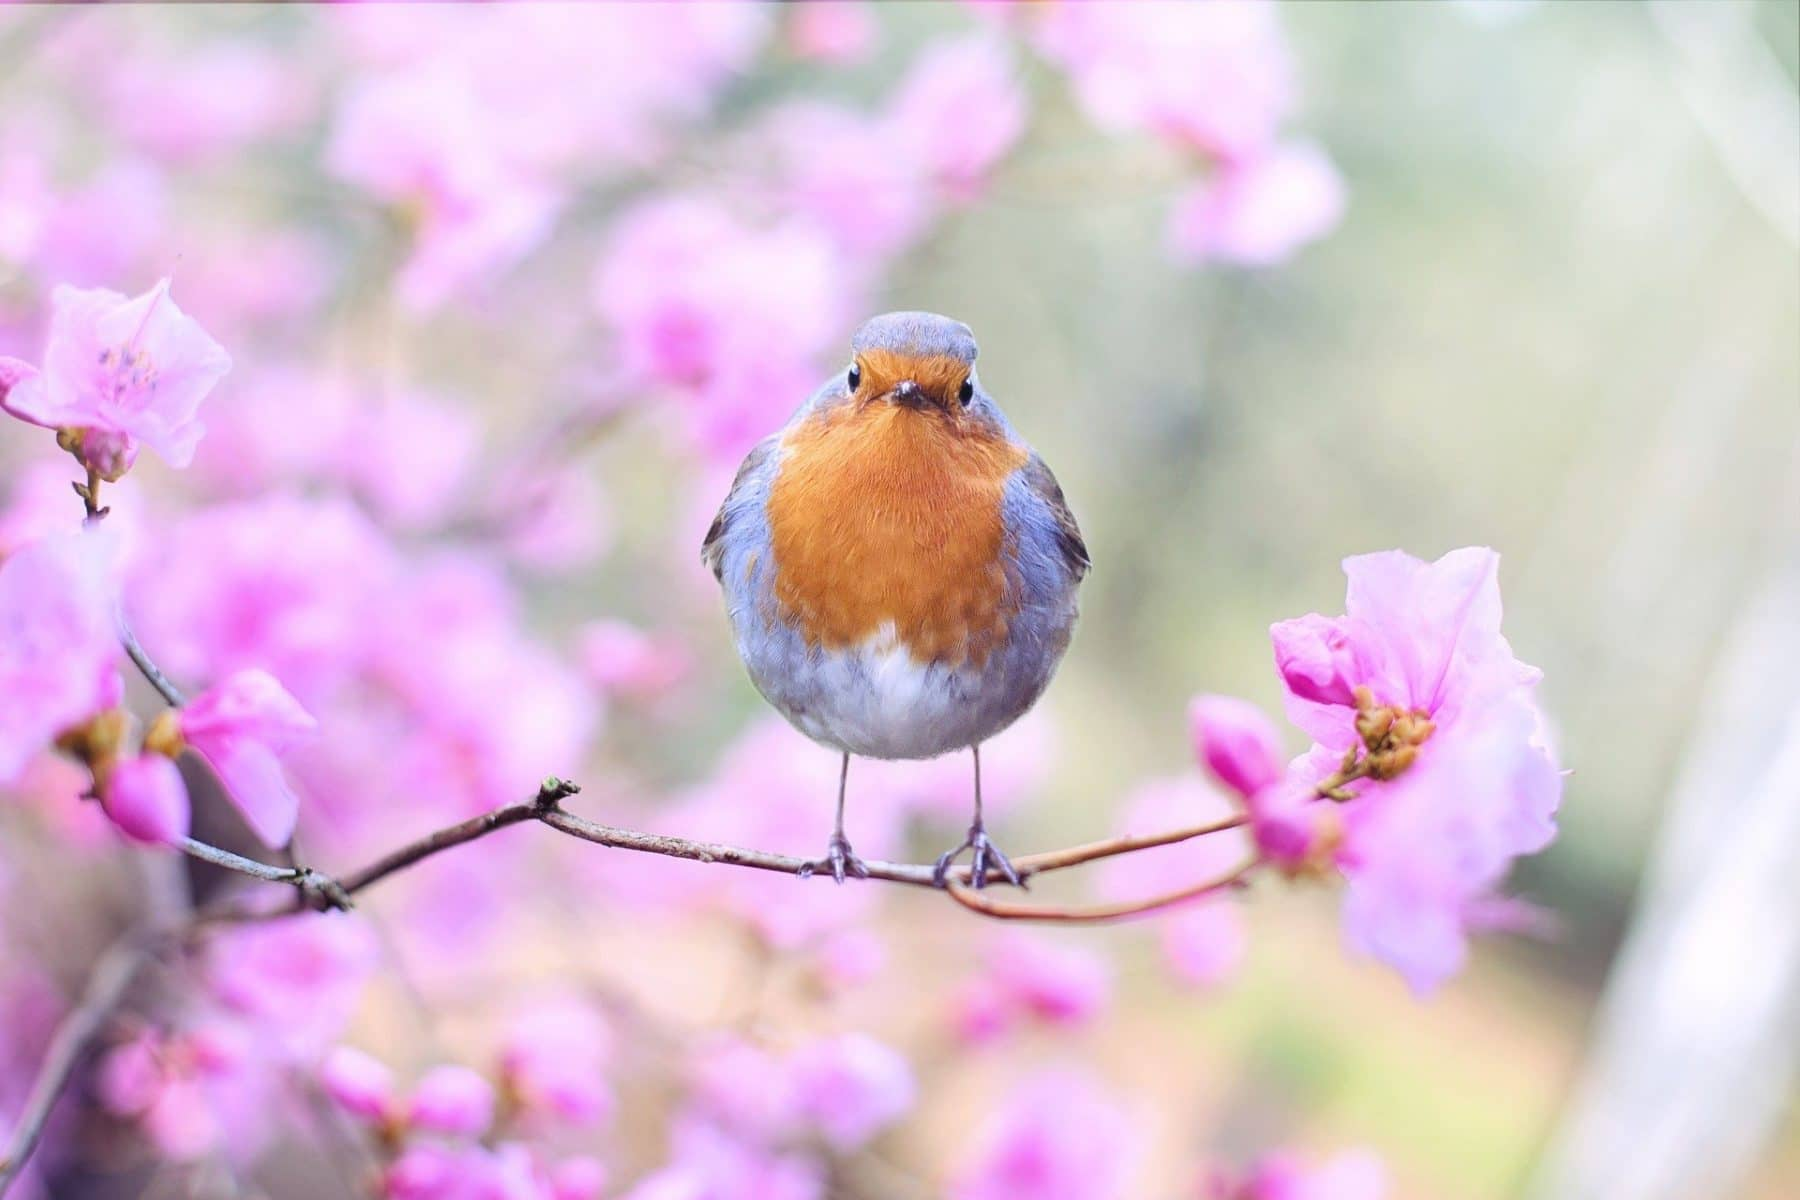 Sauvegarde de la biodiversité